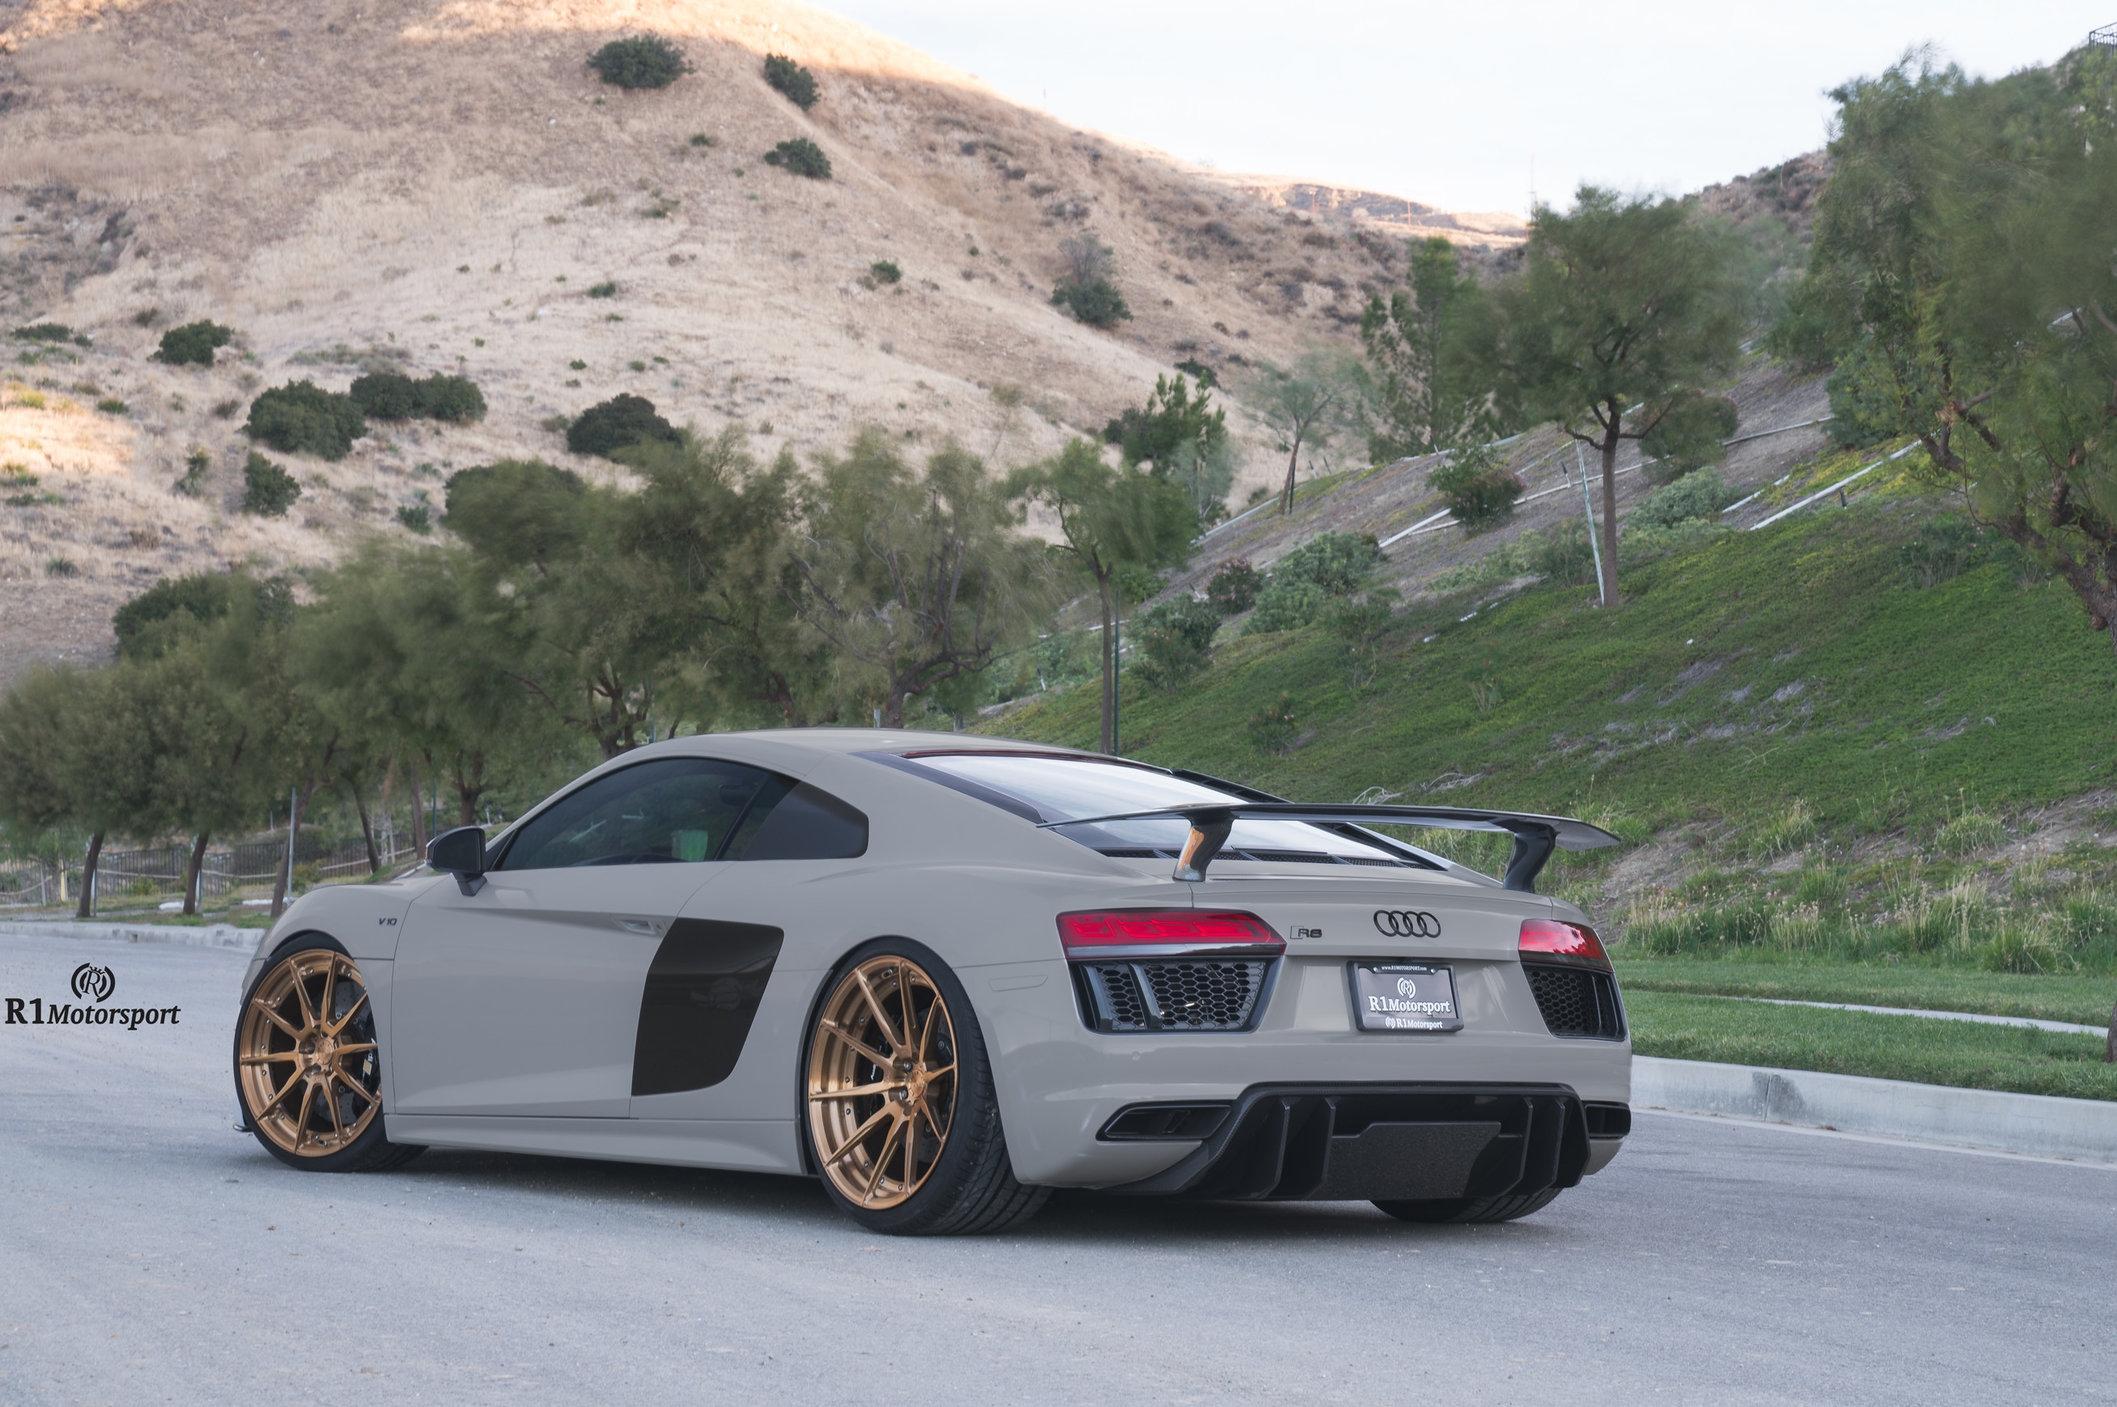 Kekurangan Audi R1 Spesifikasi